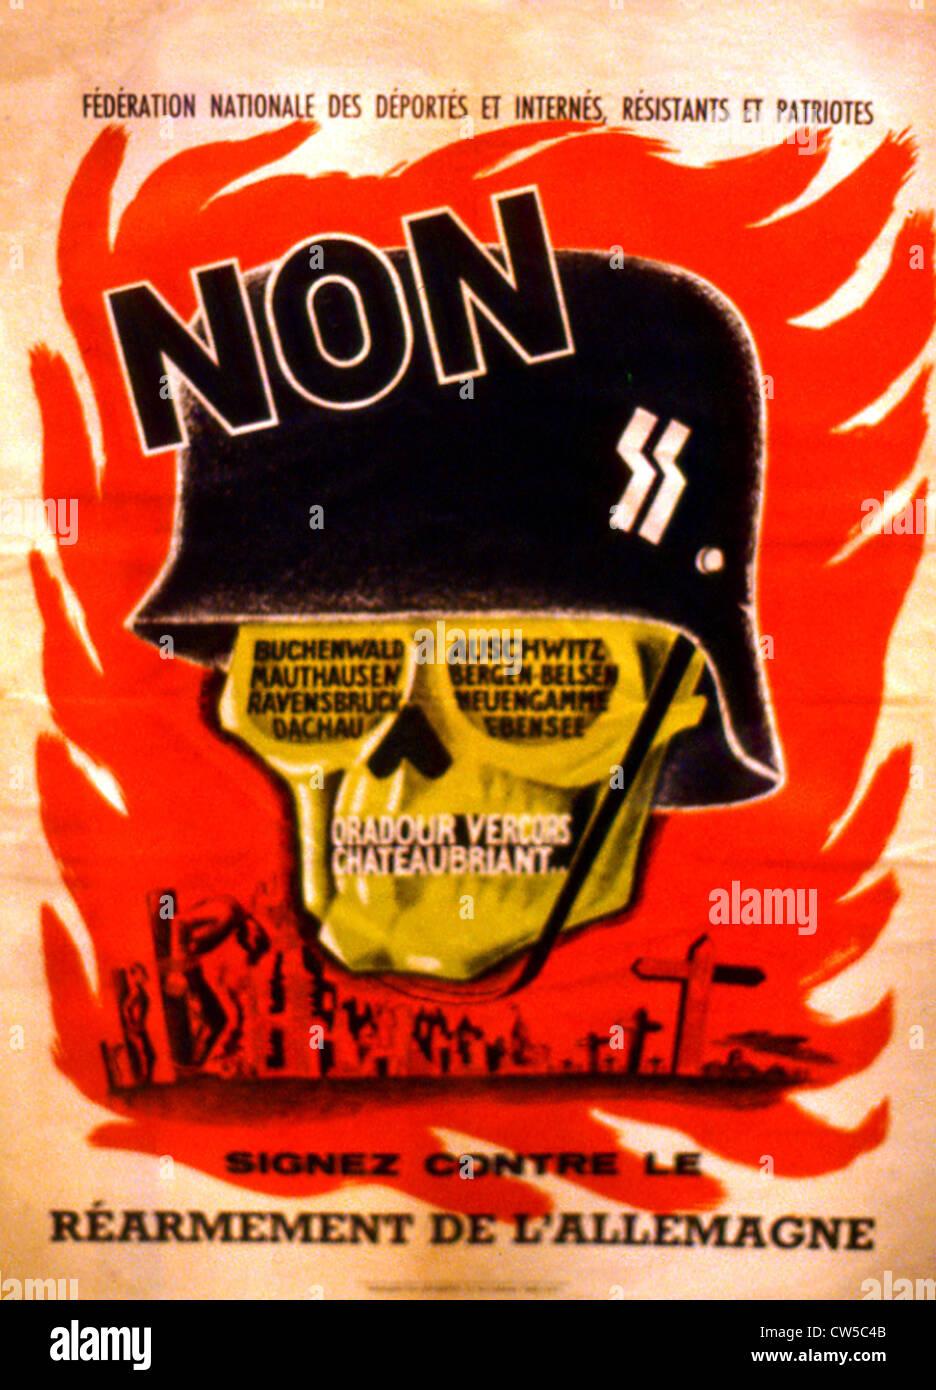 Tillard, Propaganda poster against the rearmament of Germany - Stock Image